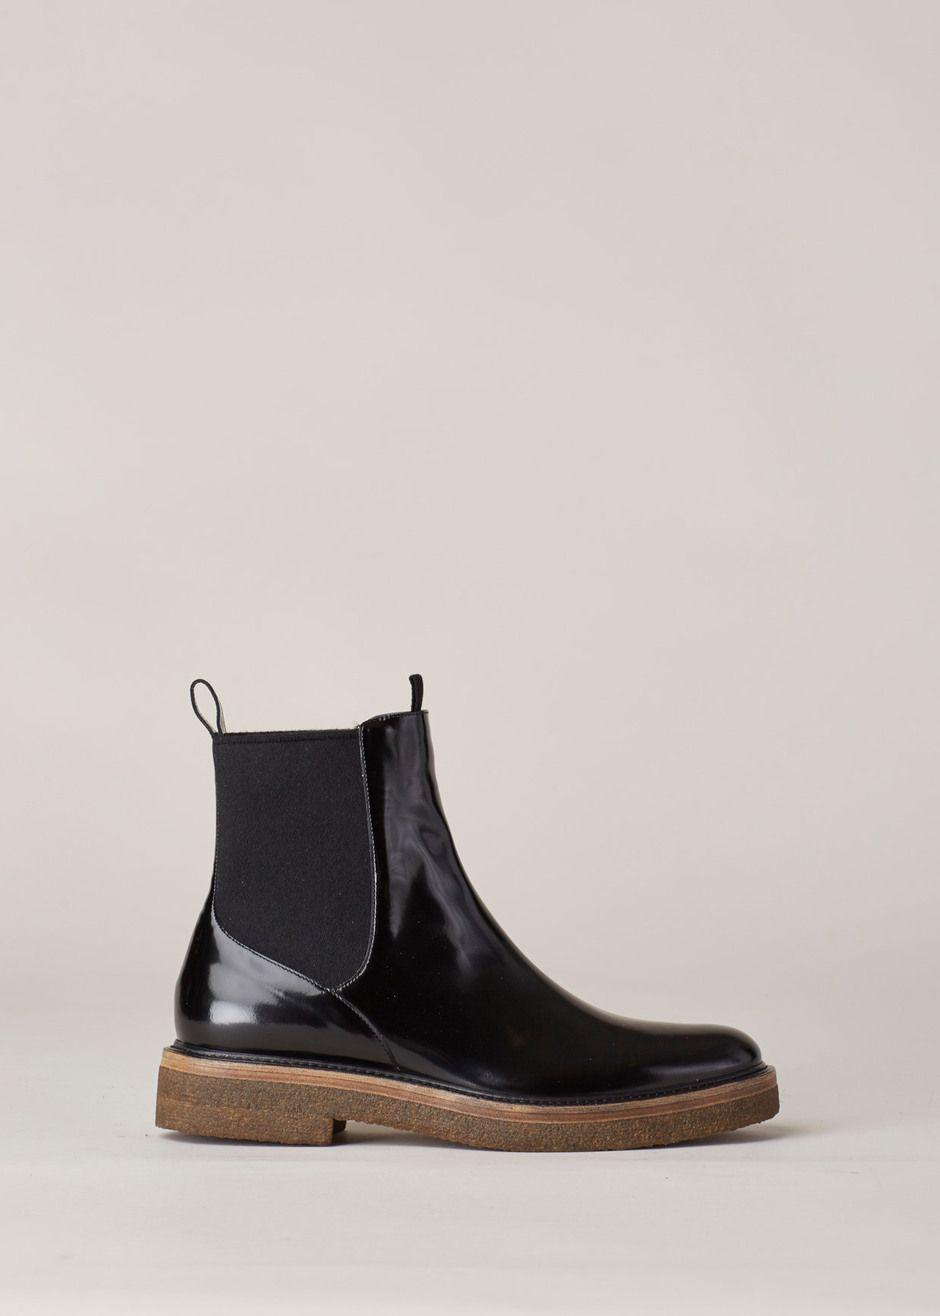 52b0e36a172 Dries Van Noten Pull On Chelsea Boot (Gloss Black)